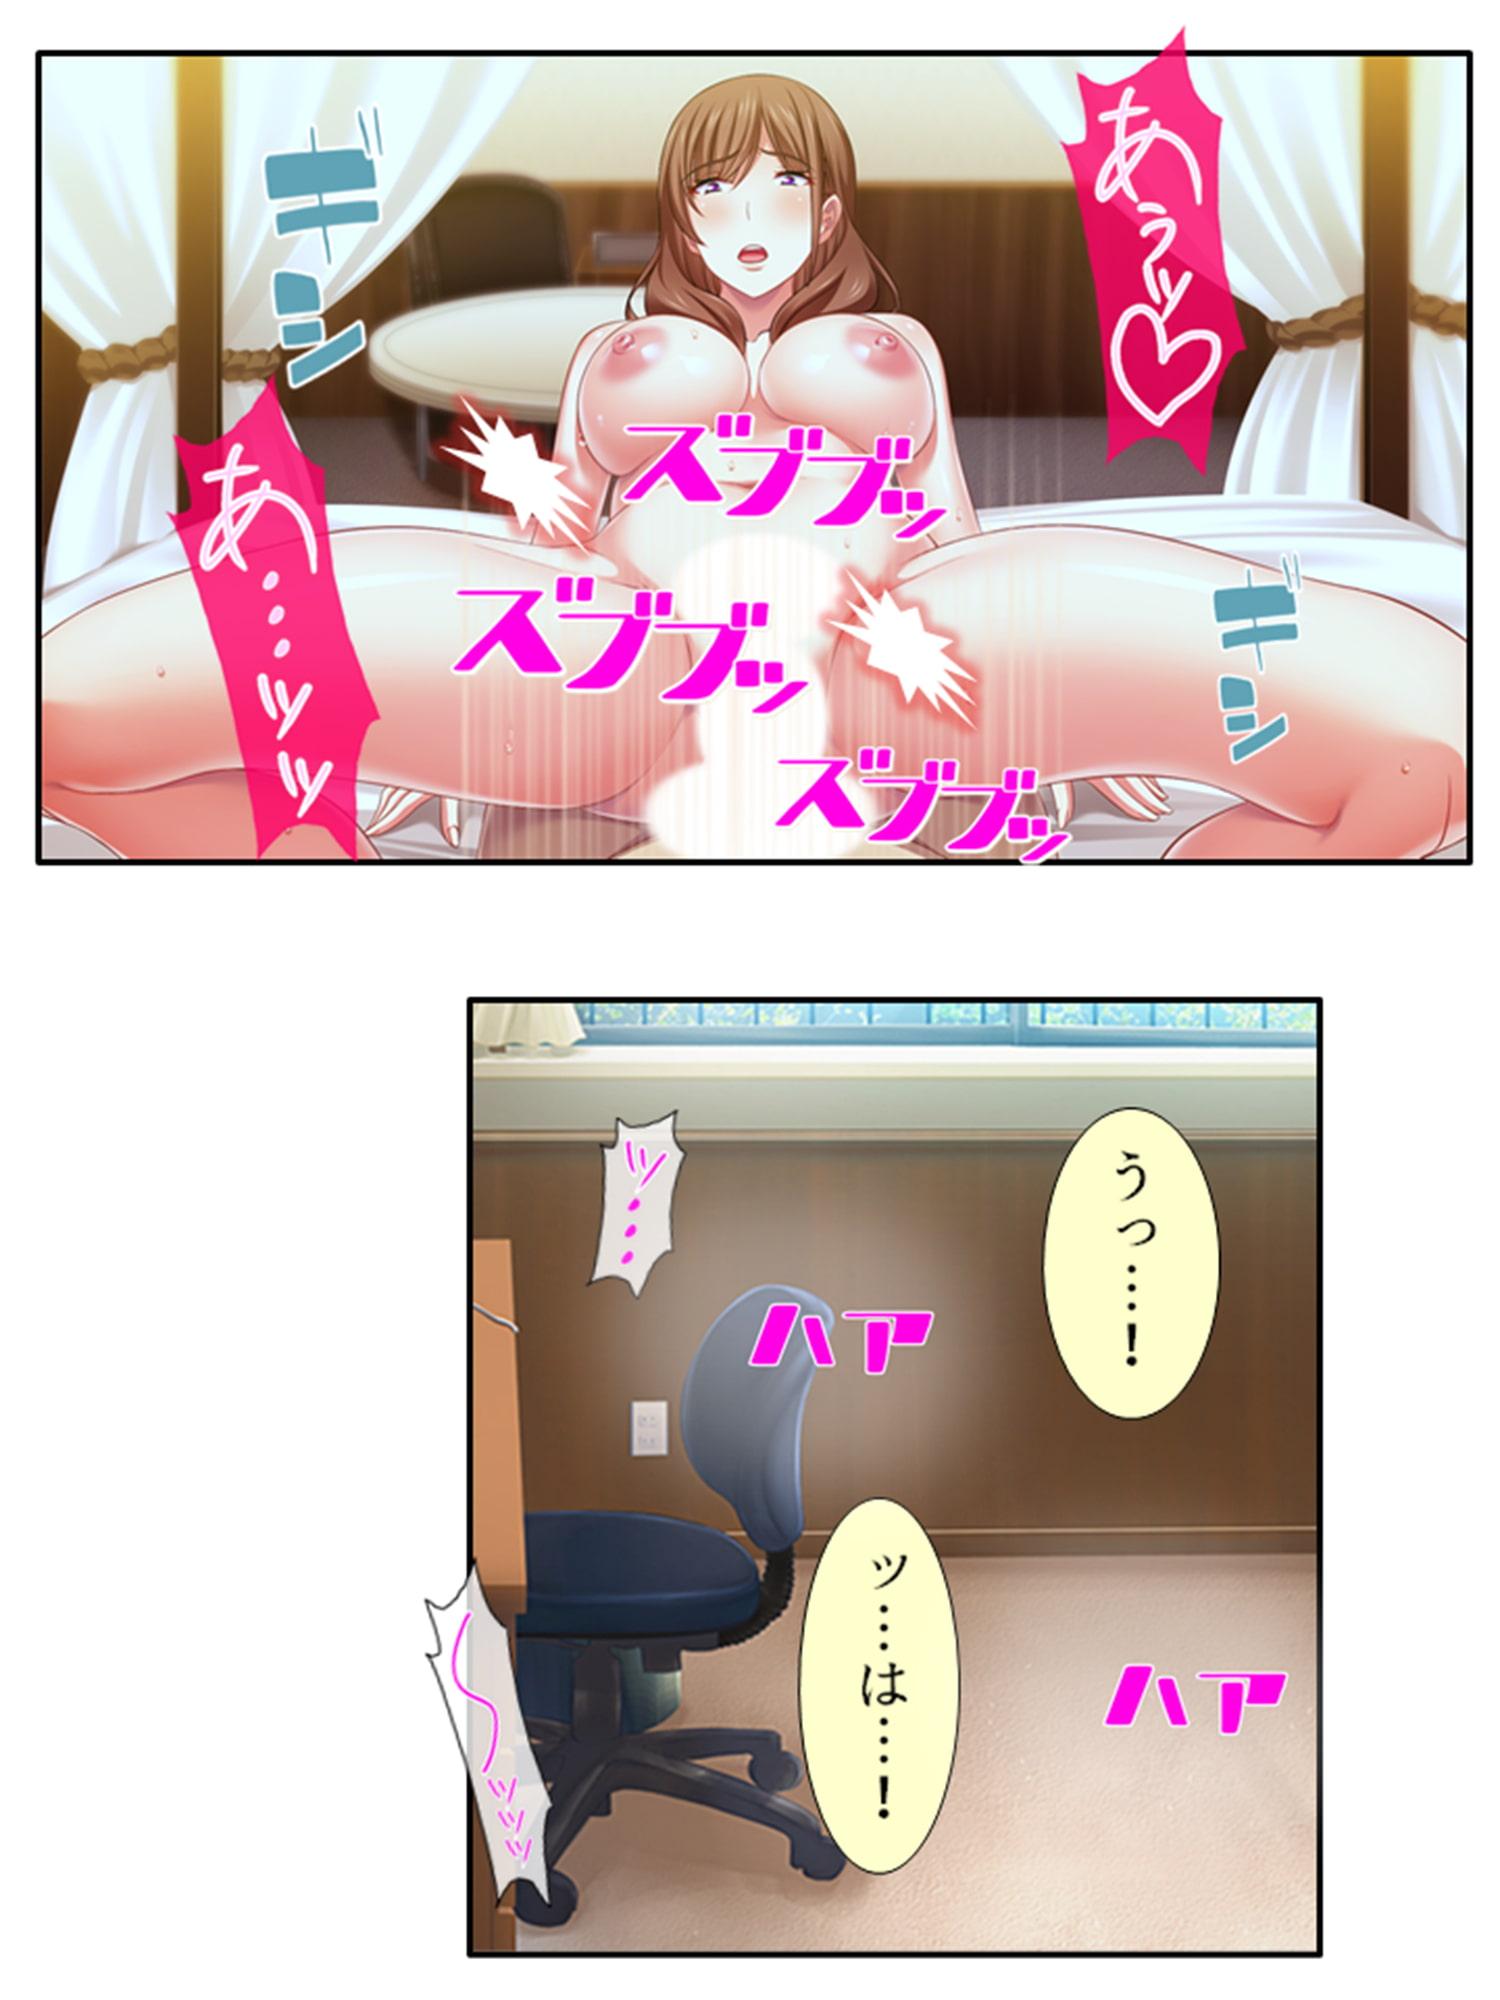 RJ320323 お前の姉ちゃんエロ過ぎねセクシー女優の友姉の悪戯 1巻 [20210313]